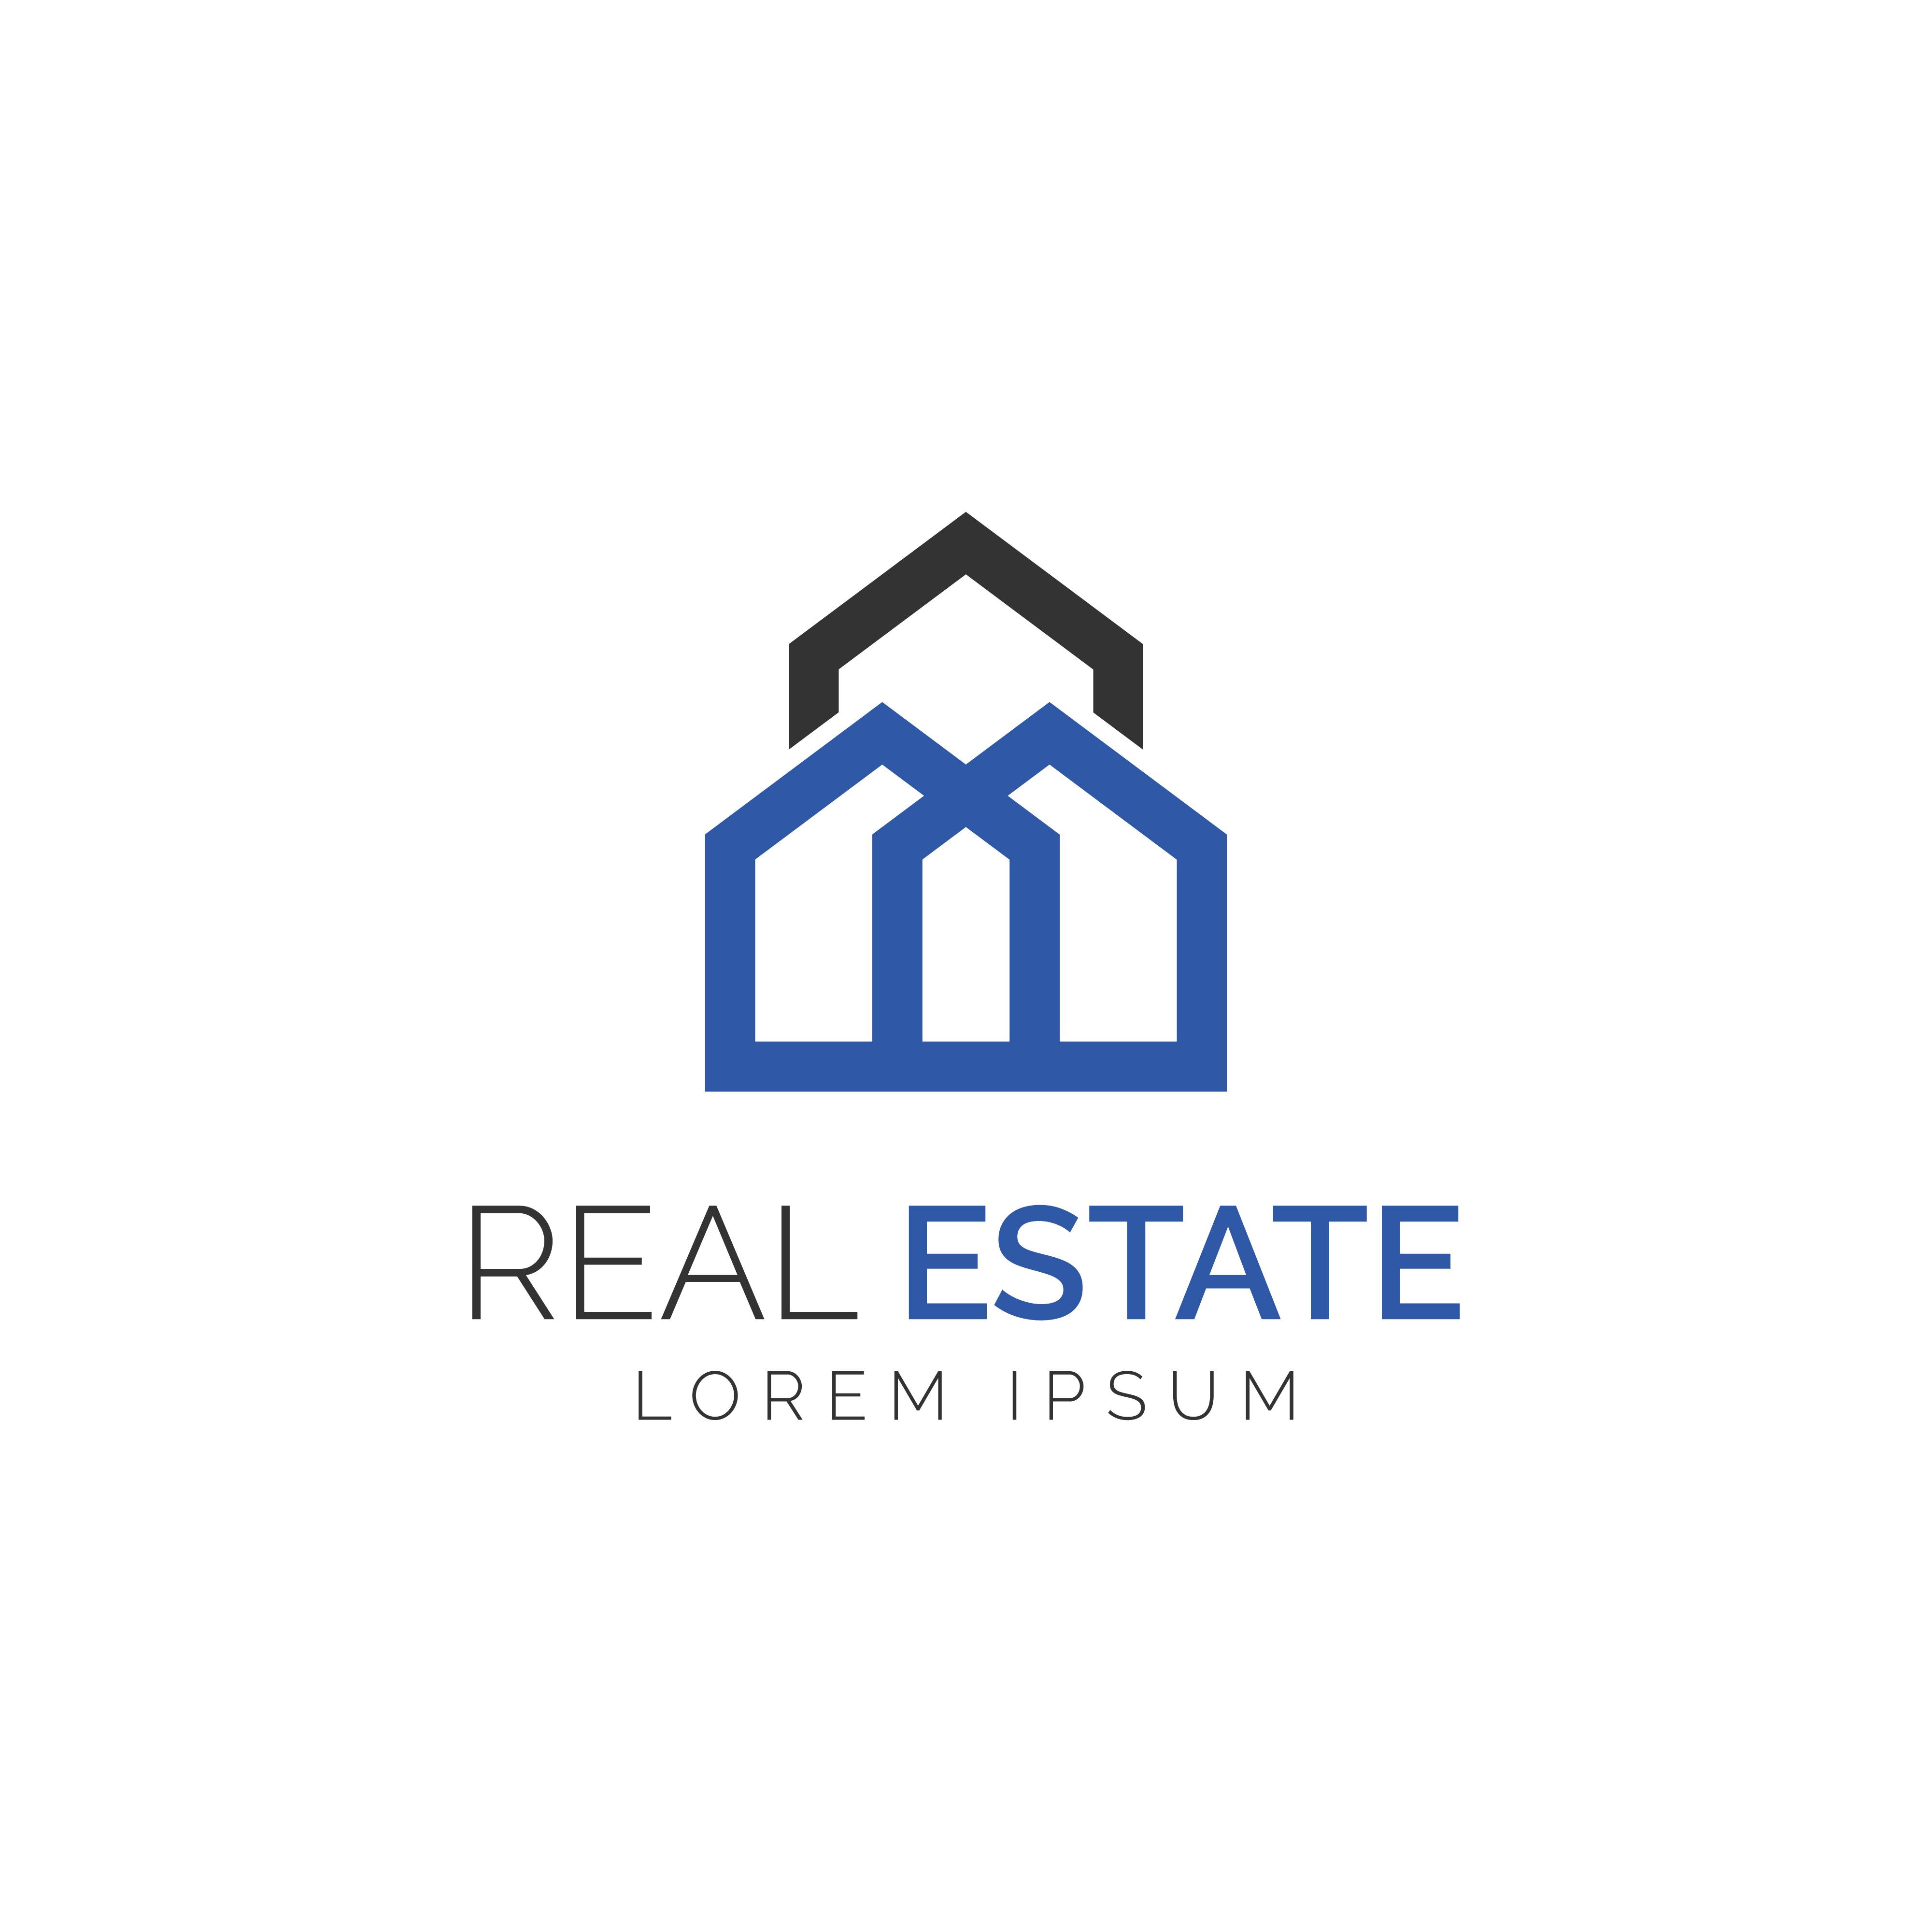 Simple Monogram Real Estate Logo Download Free Vectors Clipart Graphics Vector Art